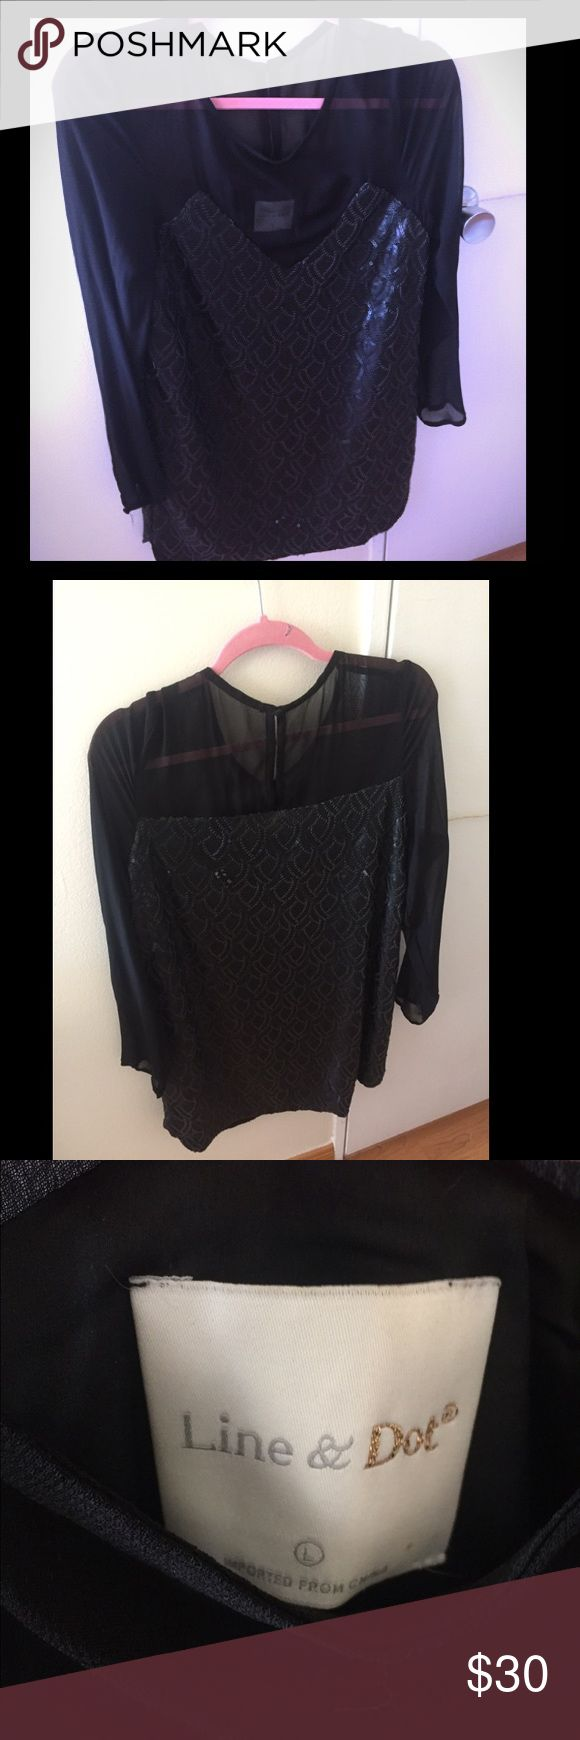 T-shirt design zeixs - Line Dot Black Sequin Cocktail Dress L Reposhing This Cute Cocktail Dress By Line